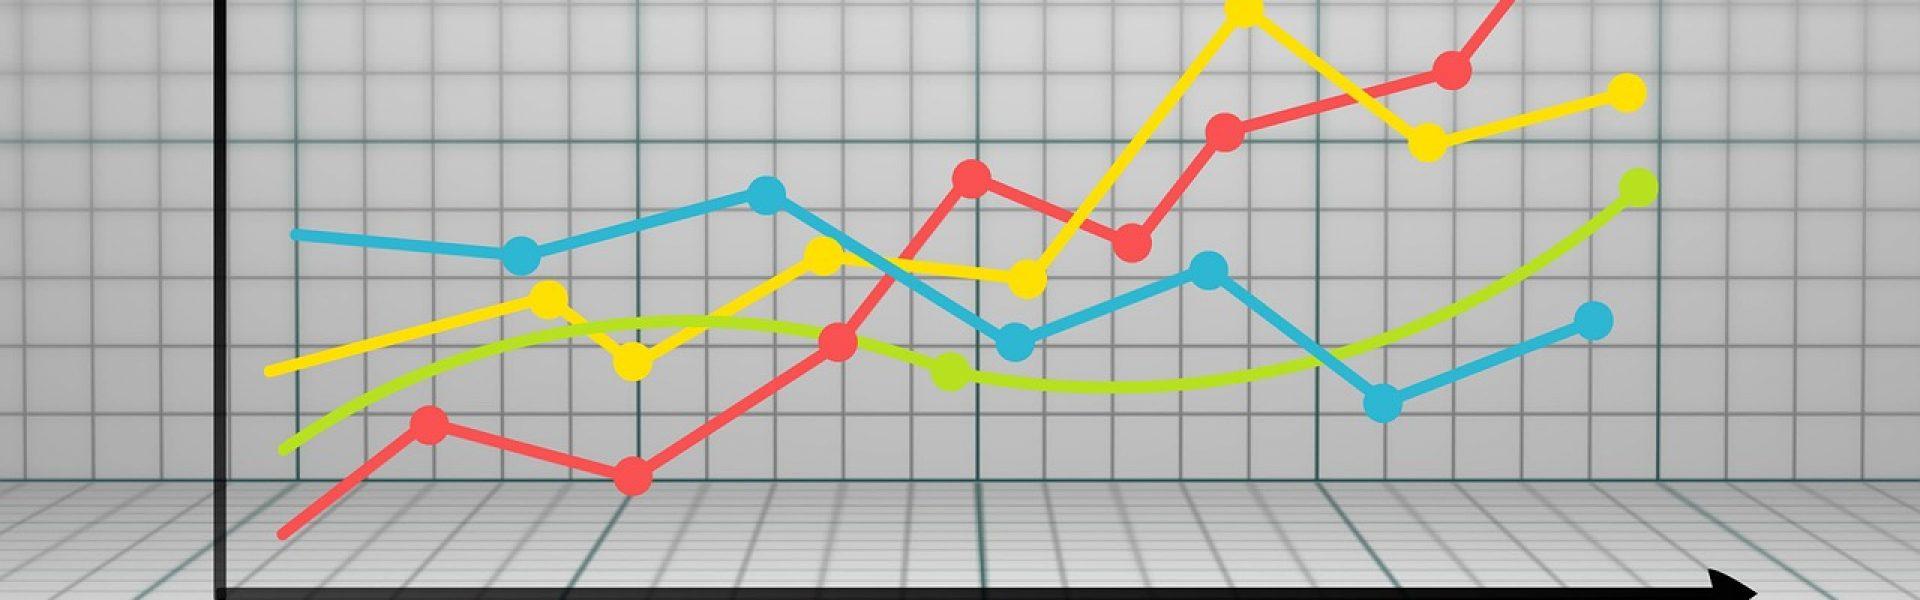 graph-3033203_1280